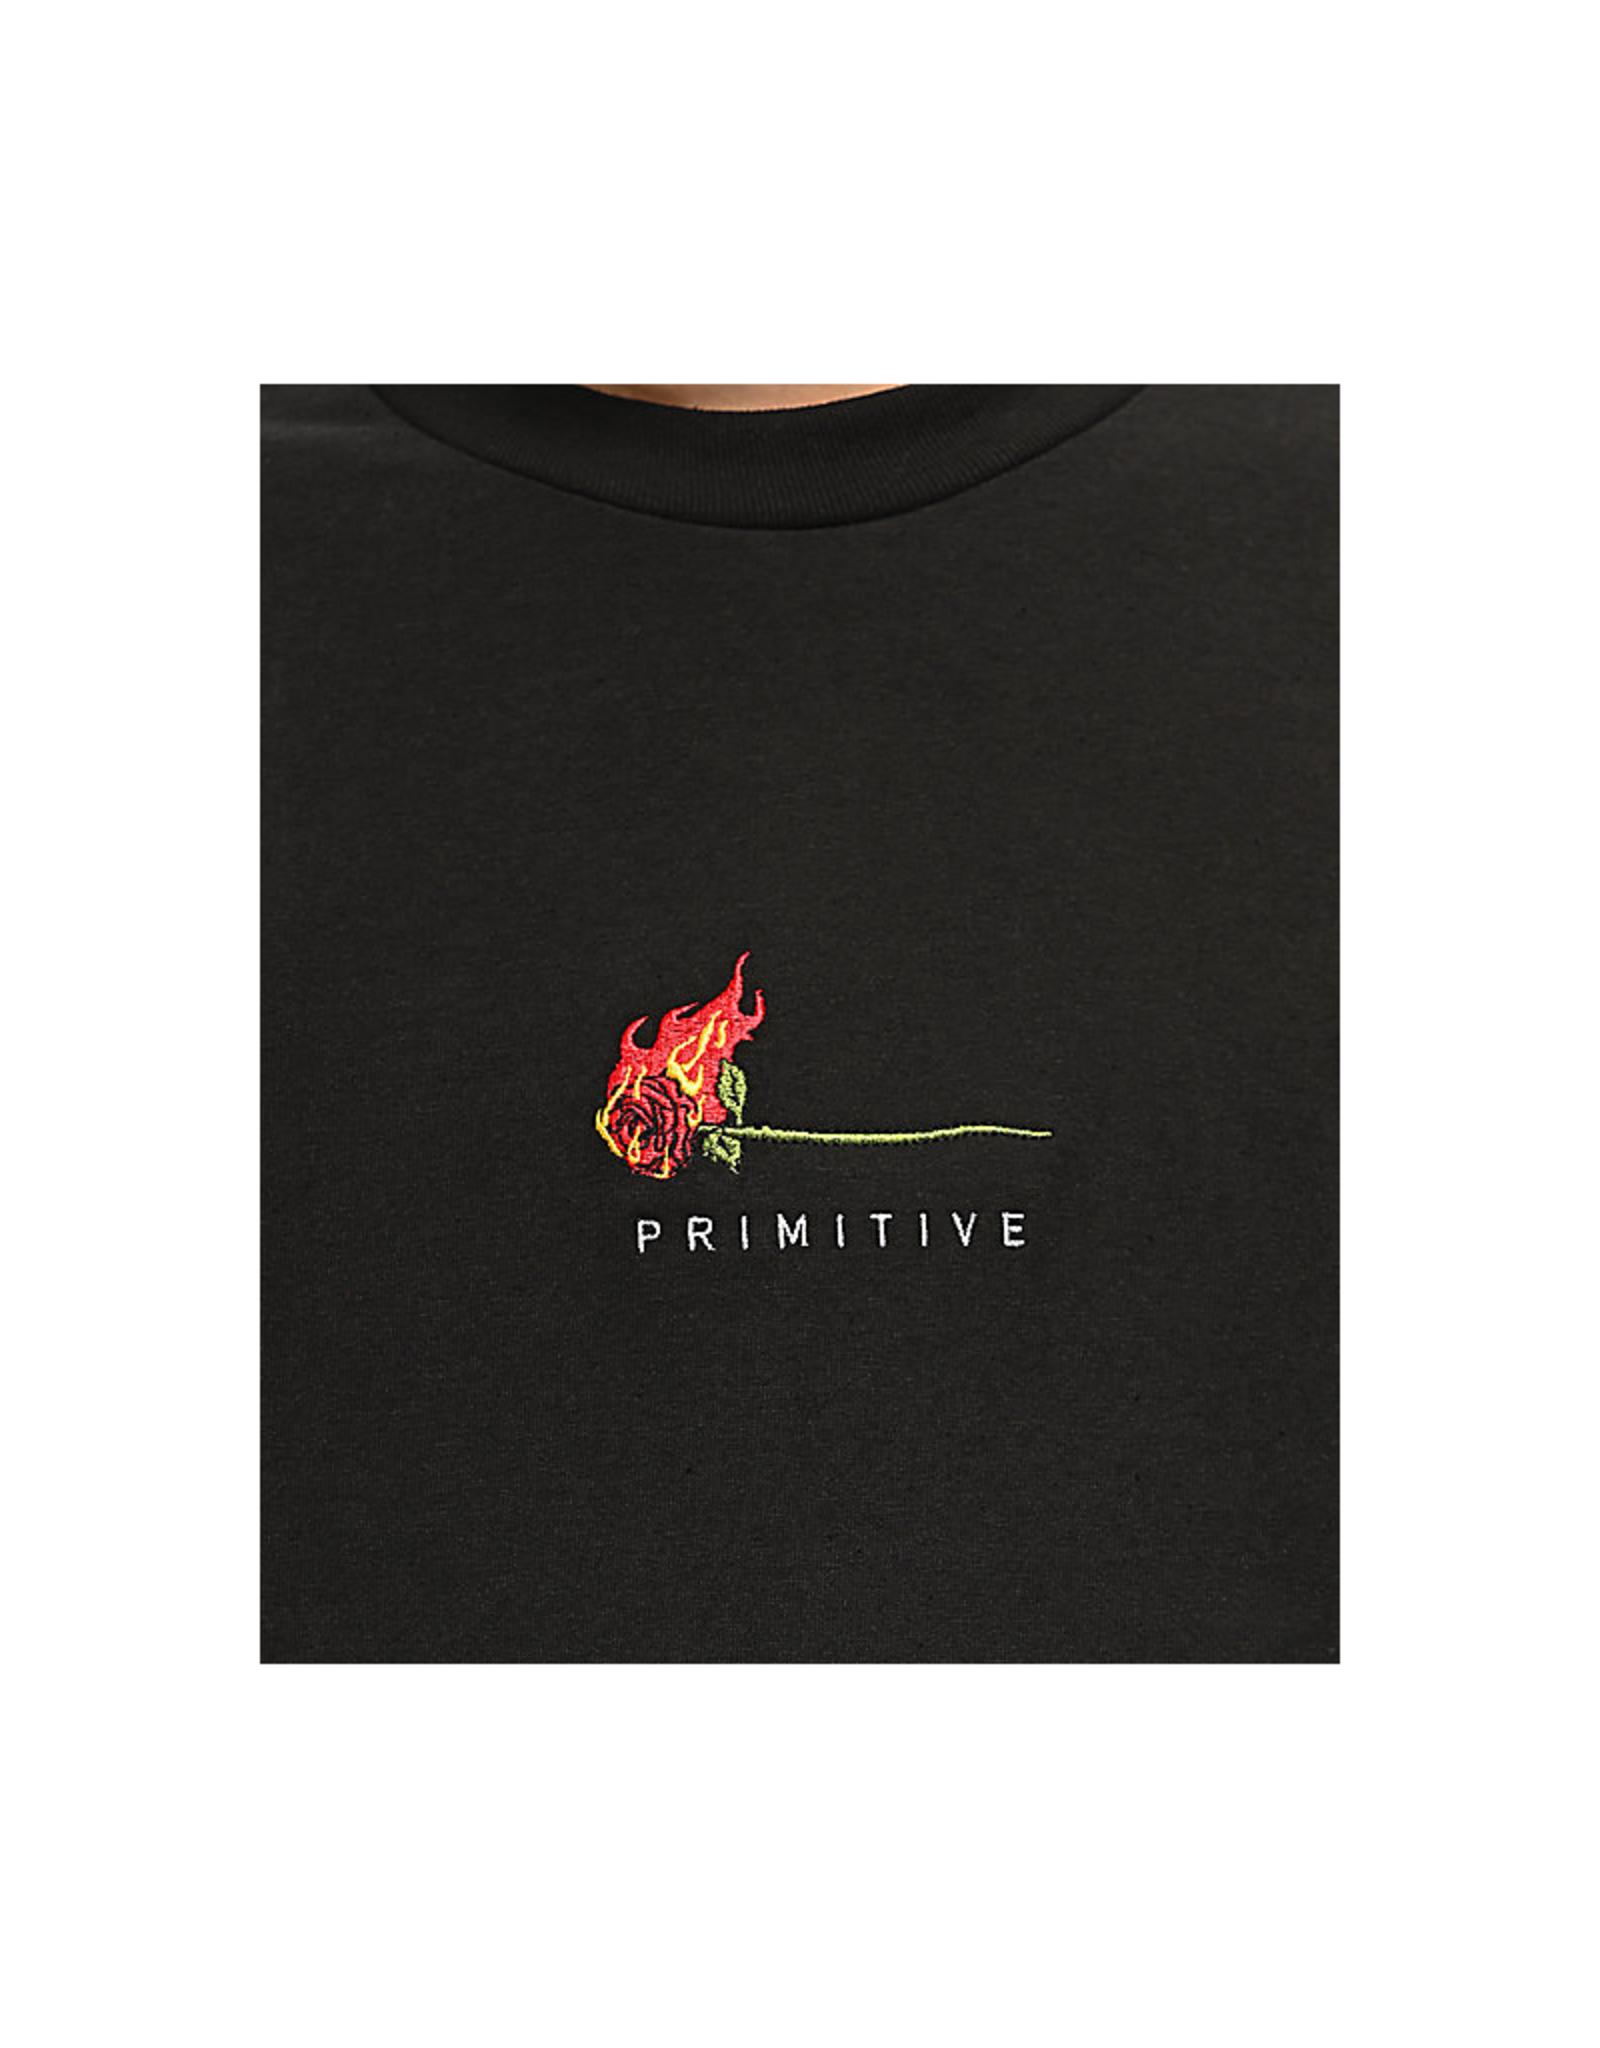 Primitive Burning Rose Tee